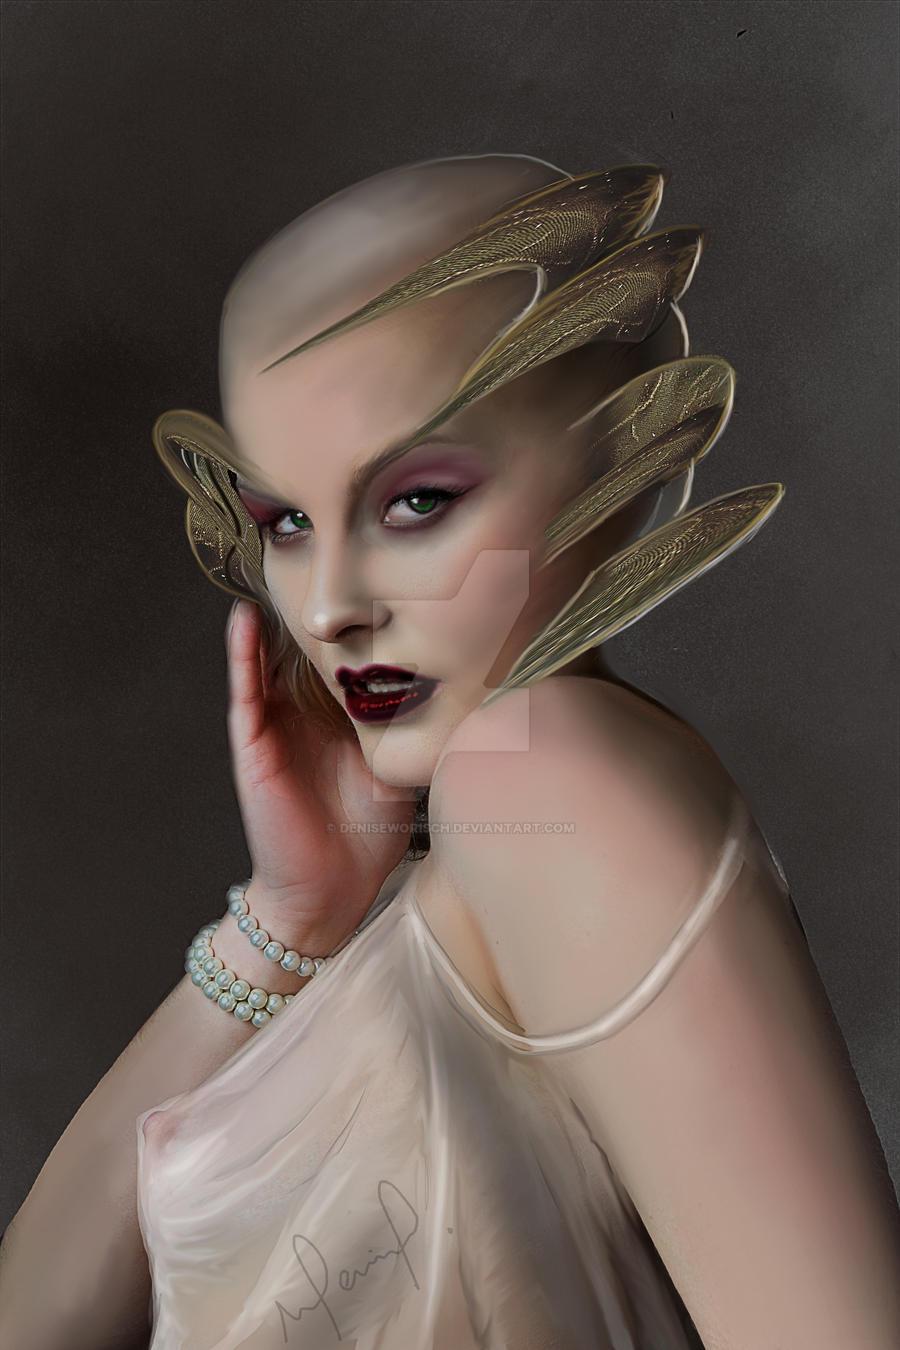 Dracovine by DeniseWorisch